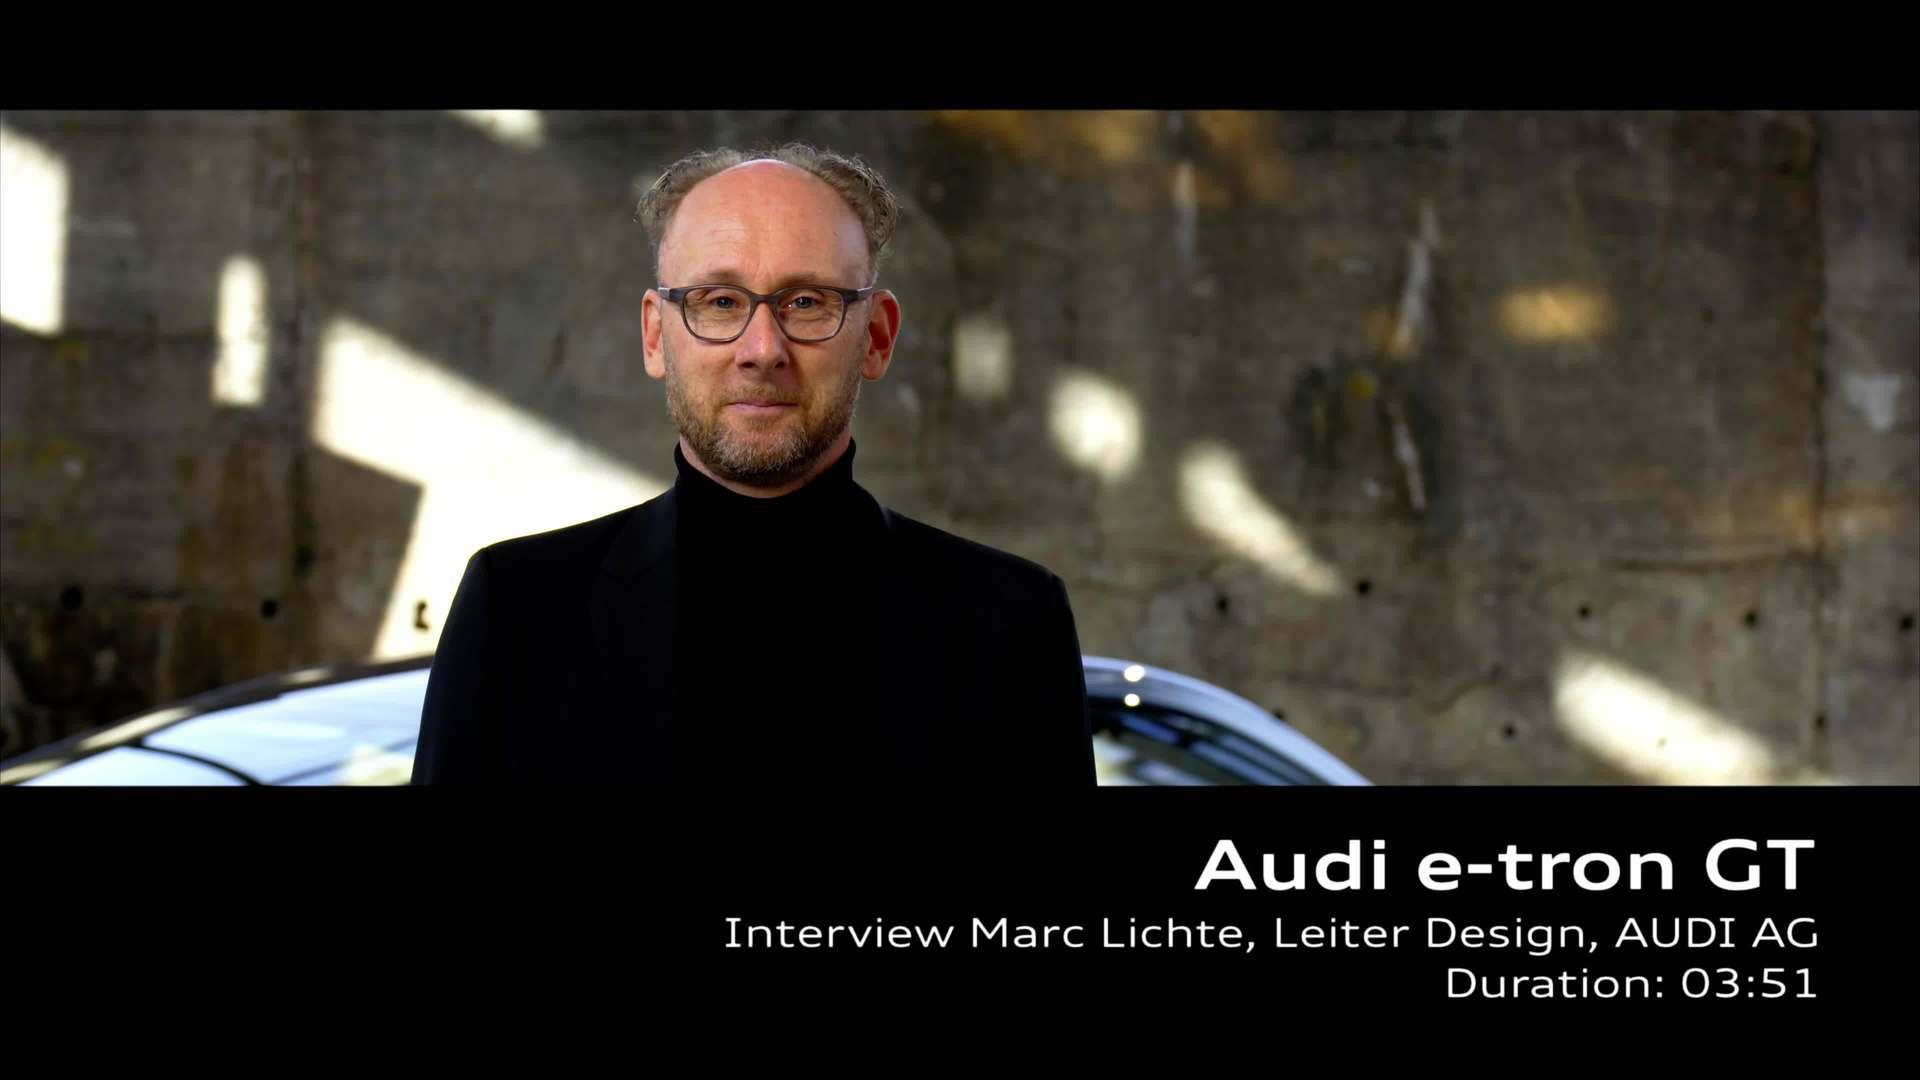 Audi e-tron GT experience: Interview Design